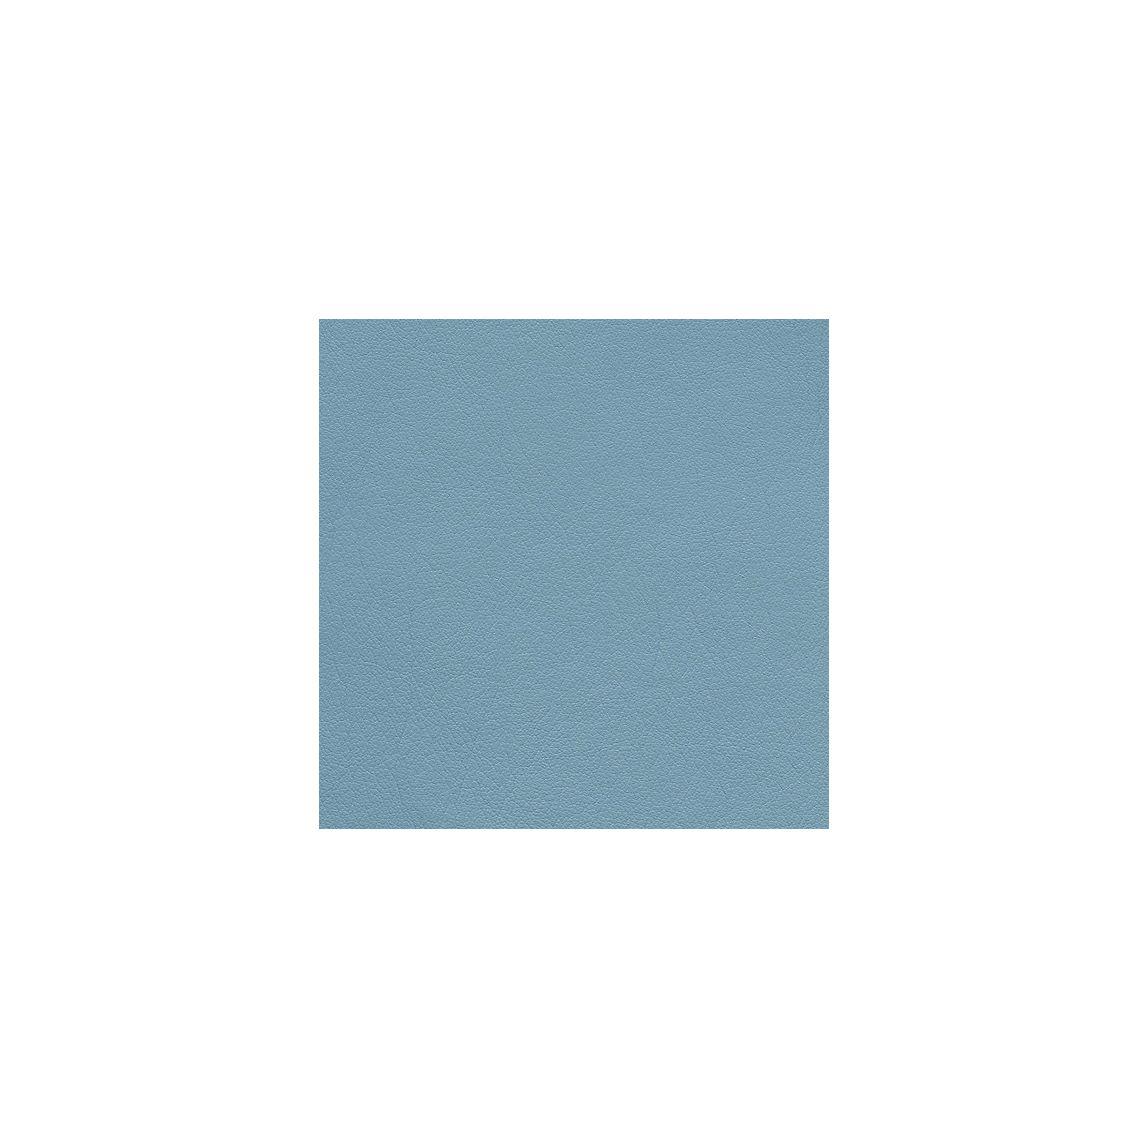 Ultraleather Pro Blue Bird Swatch